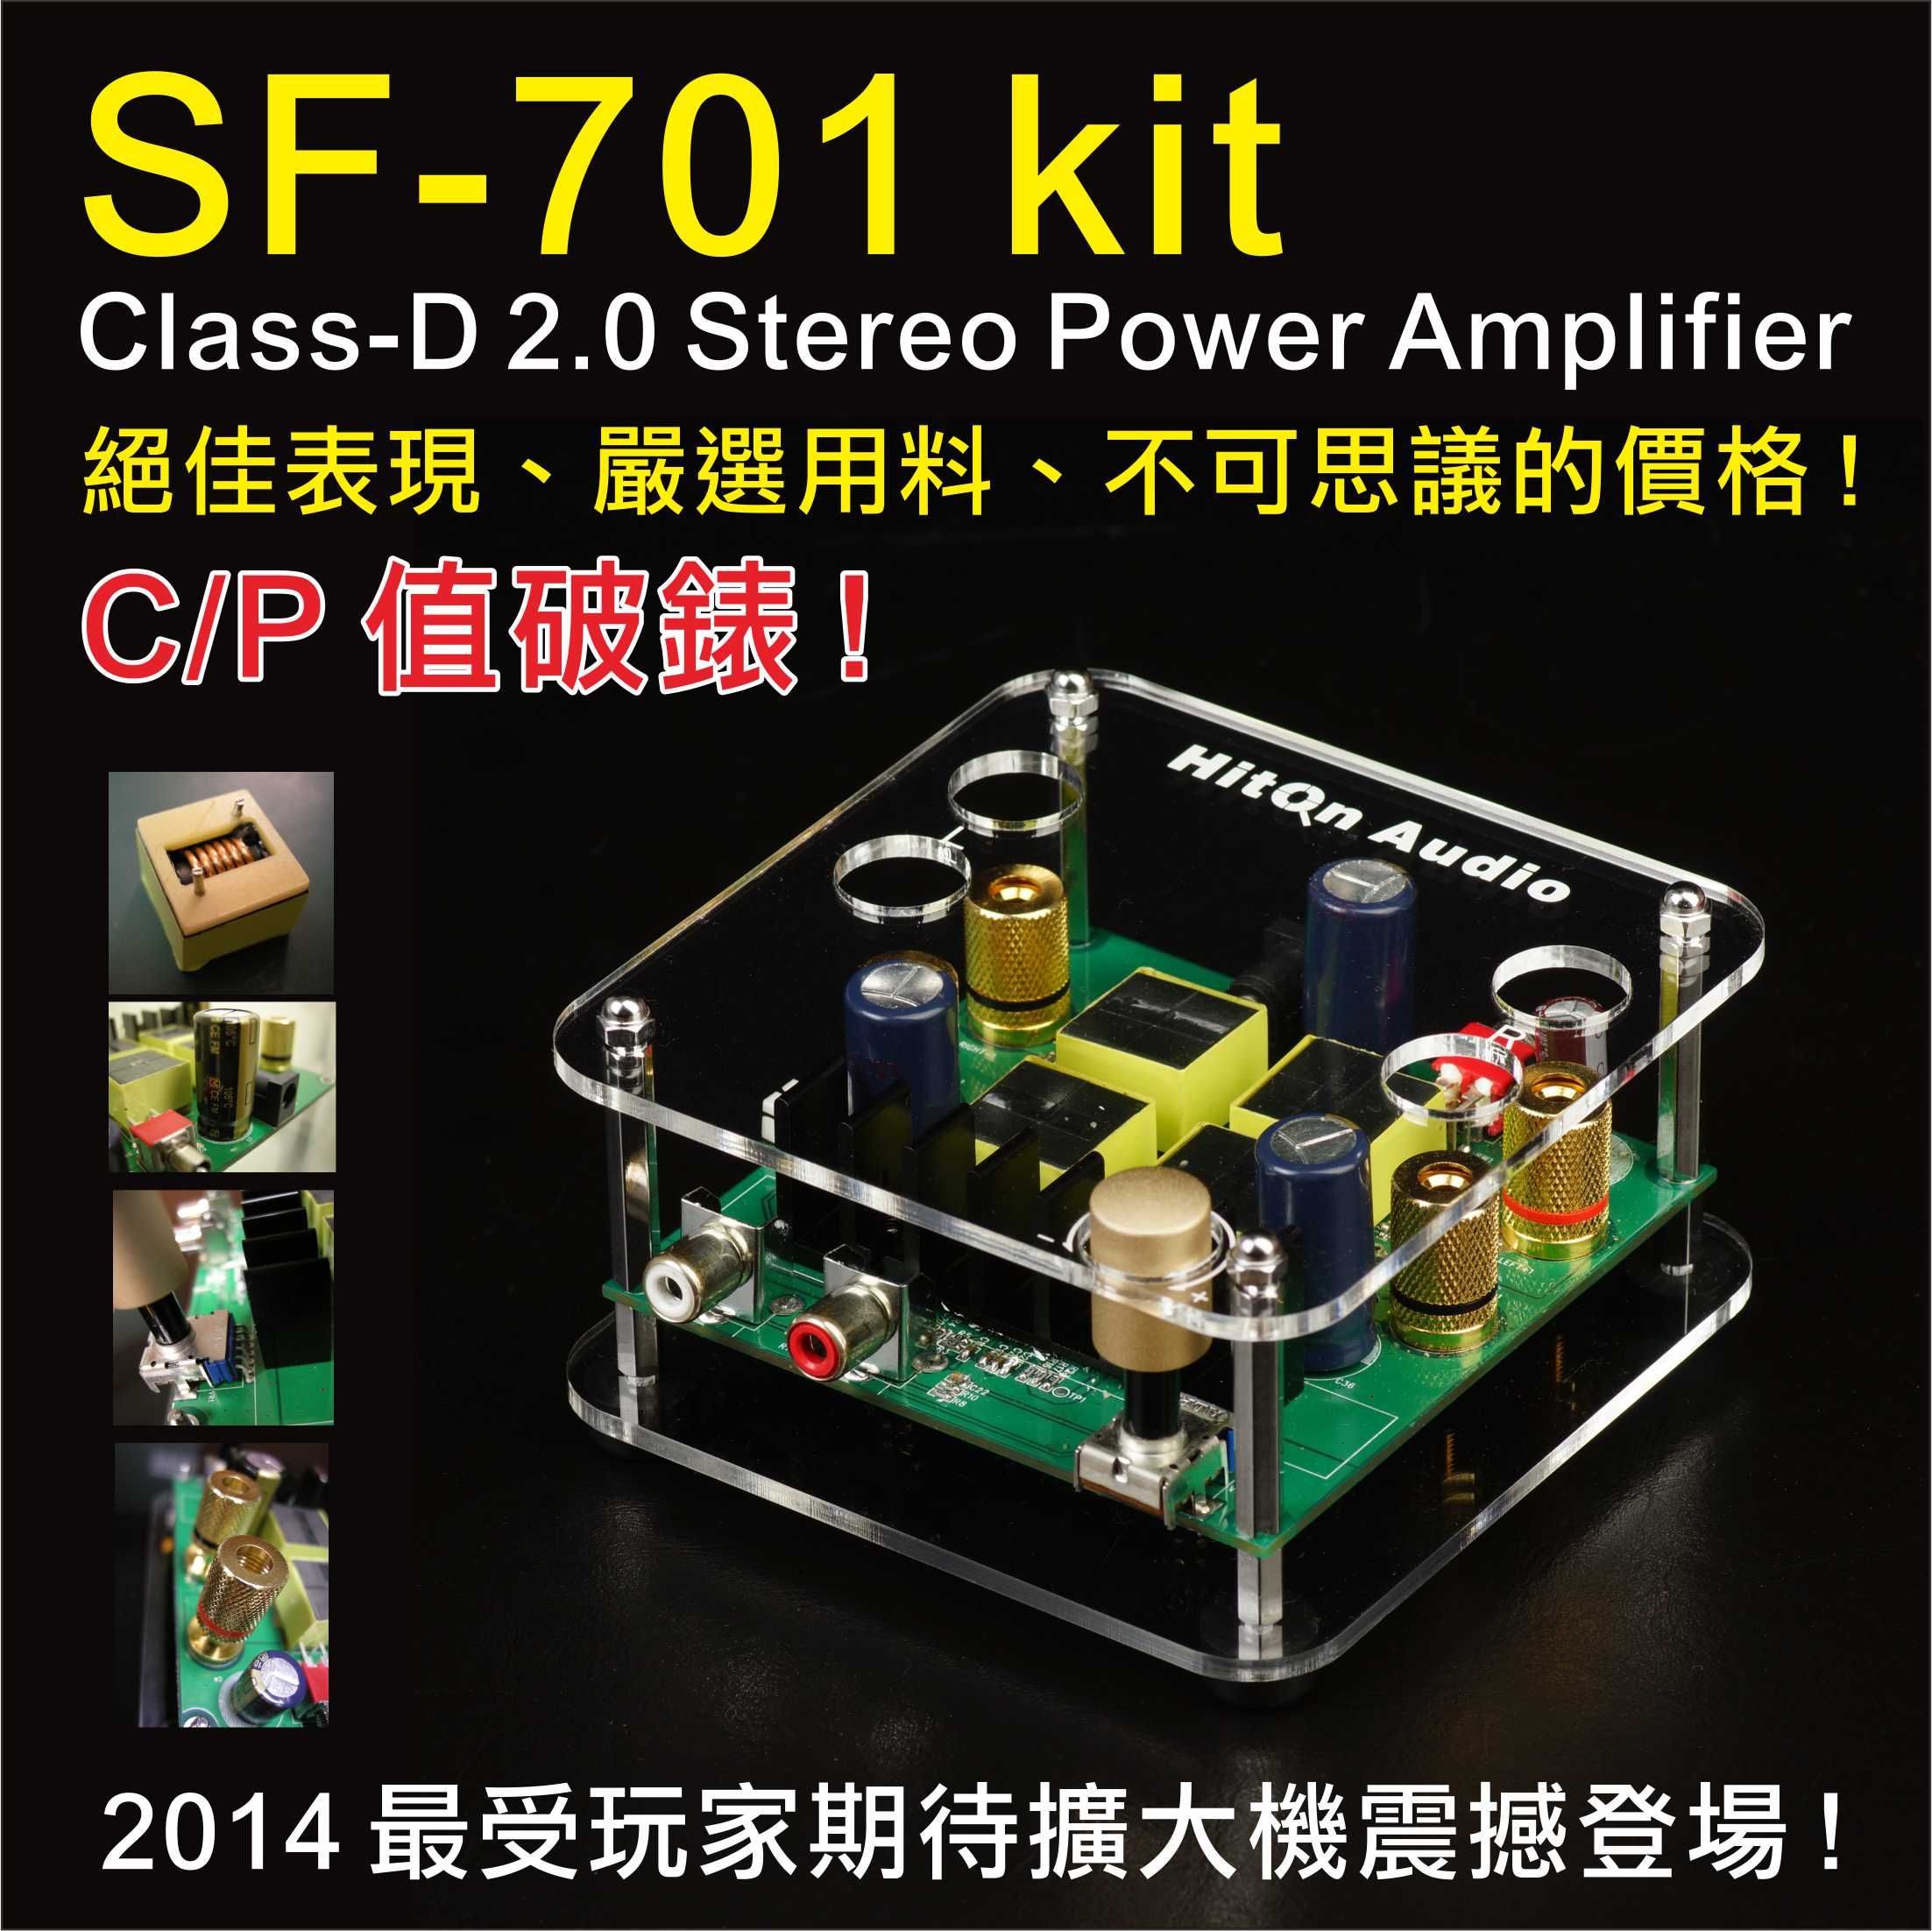 SF-701 kit 擴大機【現貨供應中】